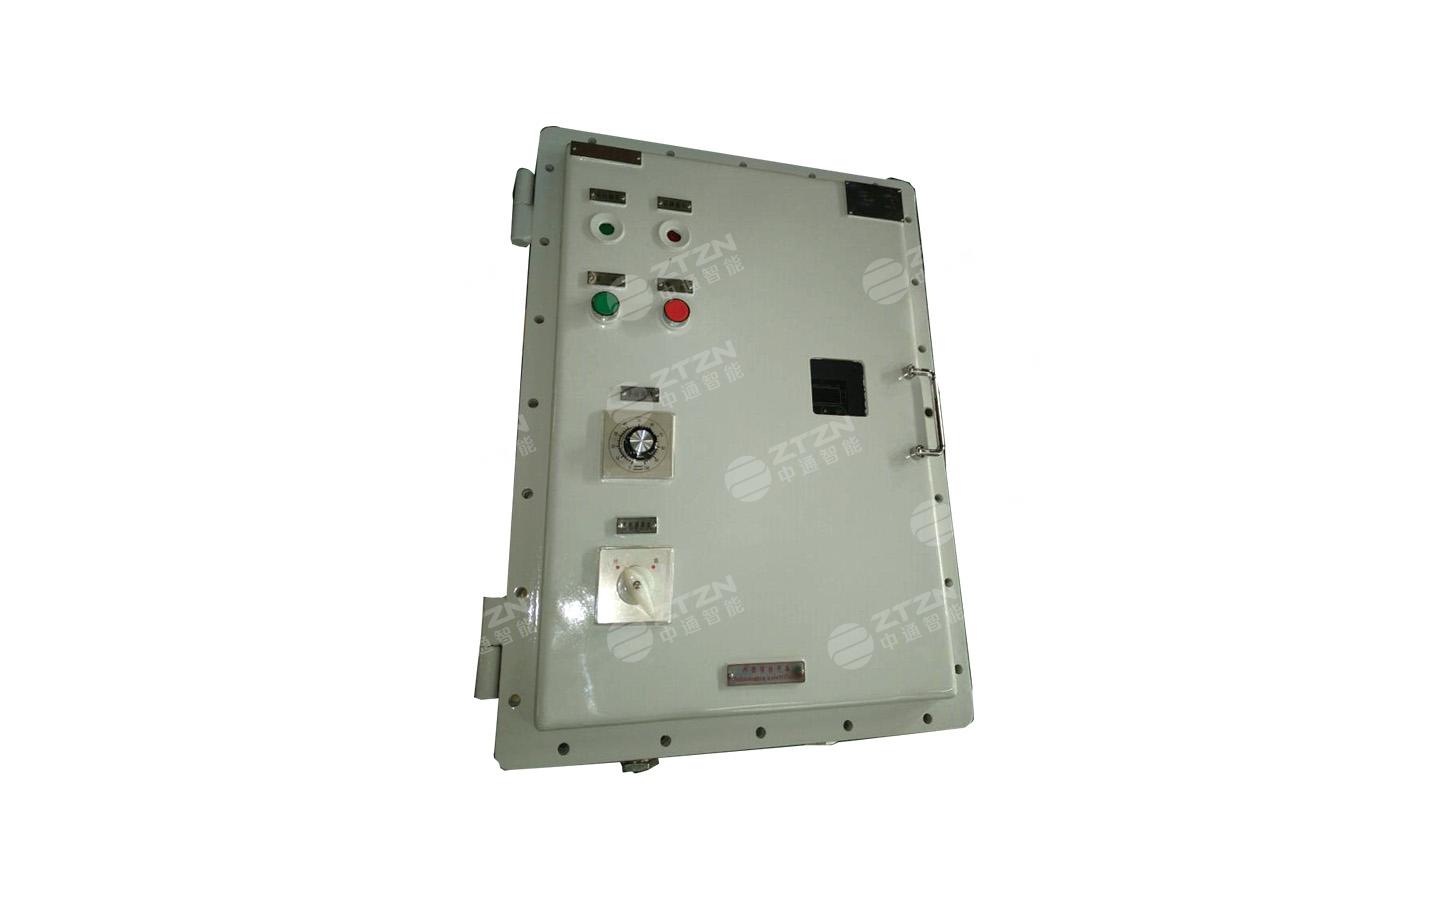 BXK51防爆电气控制箱(小功率变频箱),BXK51防爆电气控制箱(小功率变频箱)价格,BXK51防爆电气控制箱(小功率变频箱)厂家